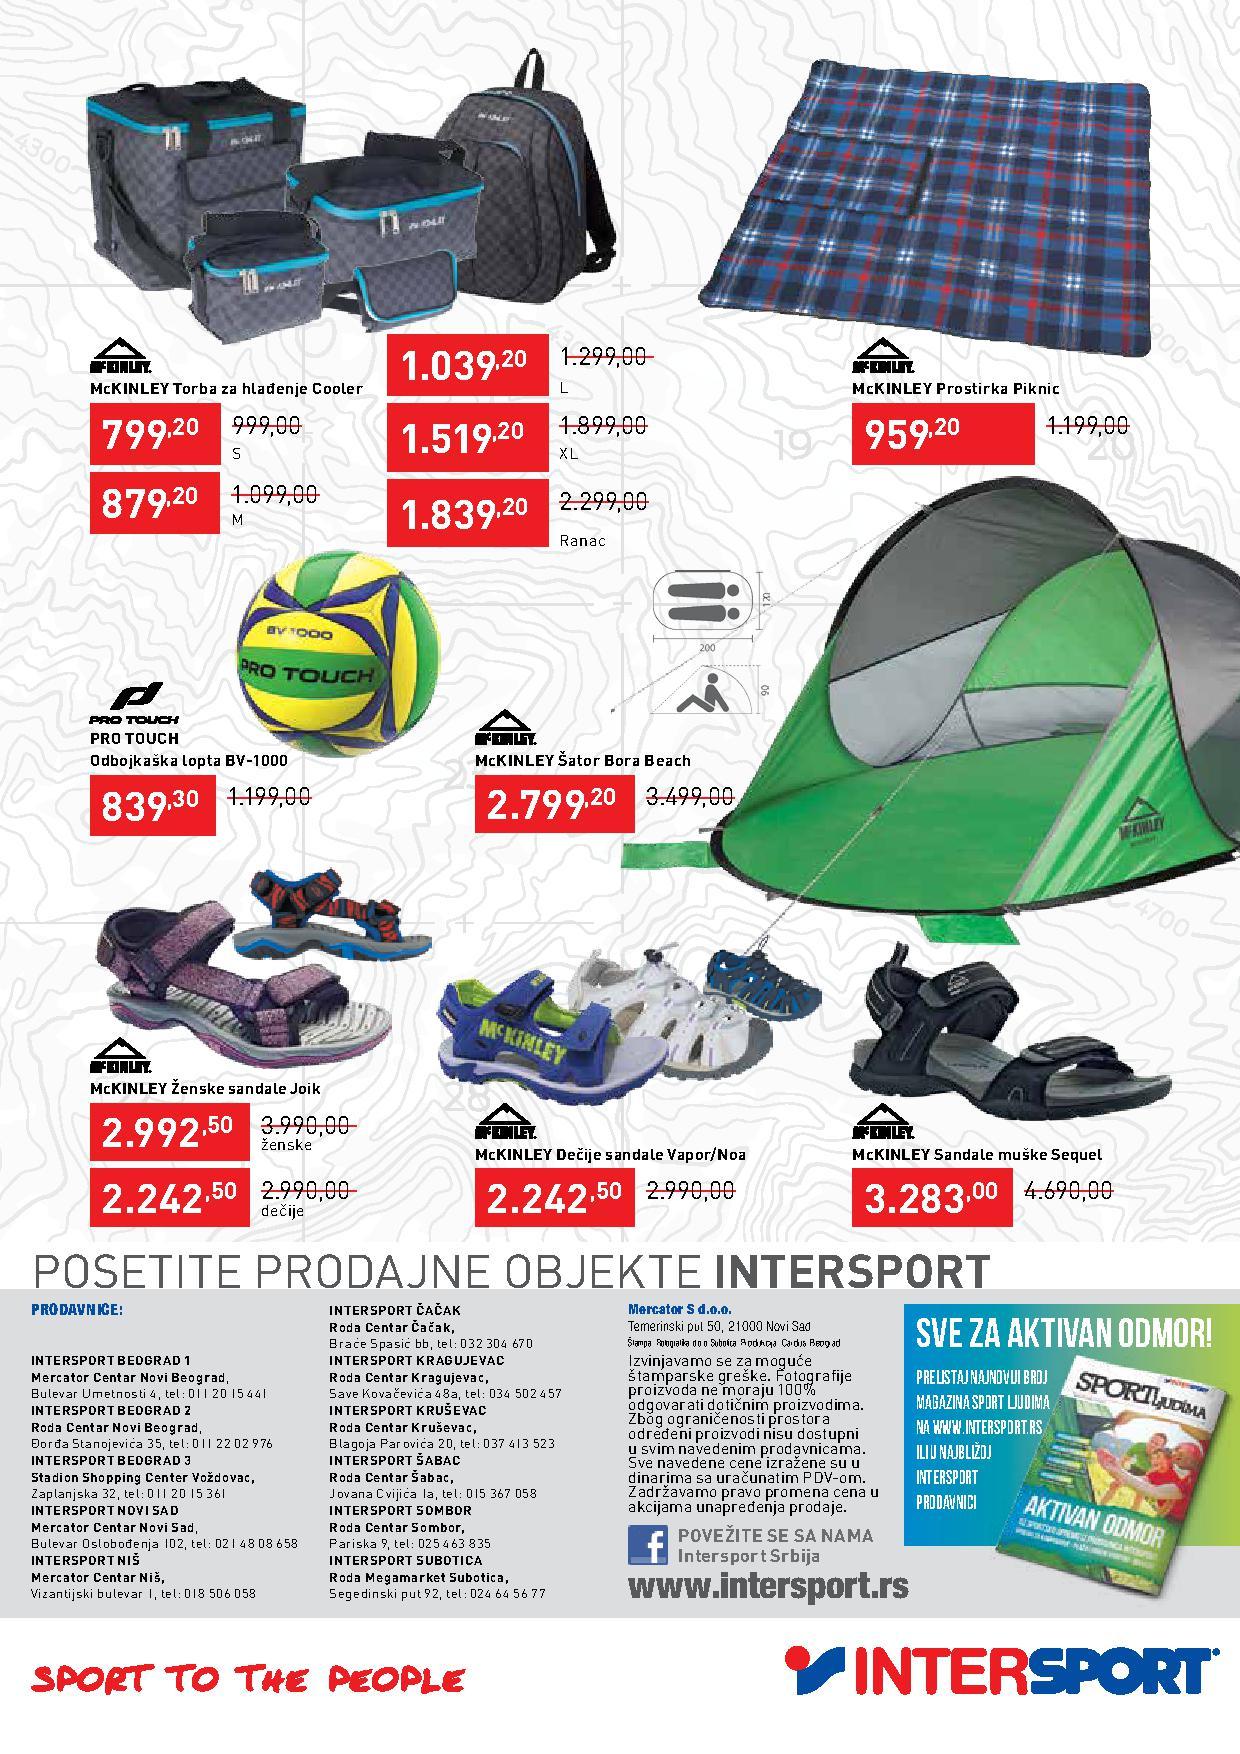 Intersport katalog letnje ponude